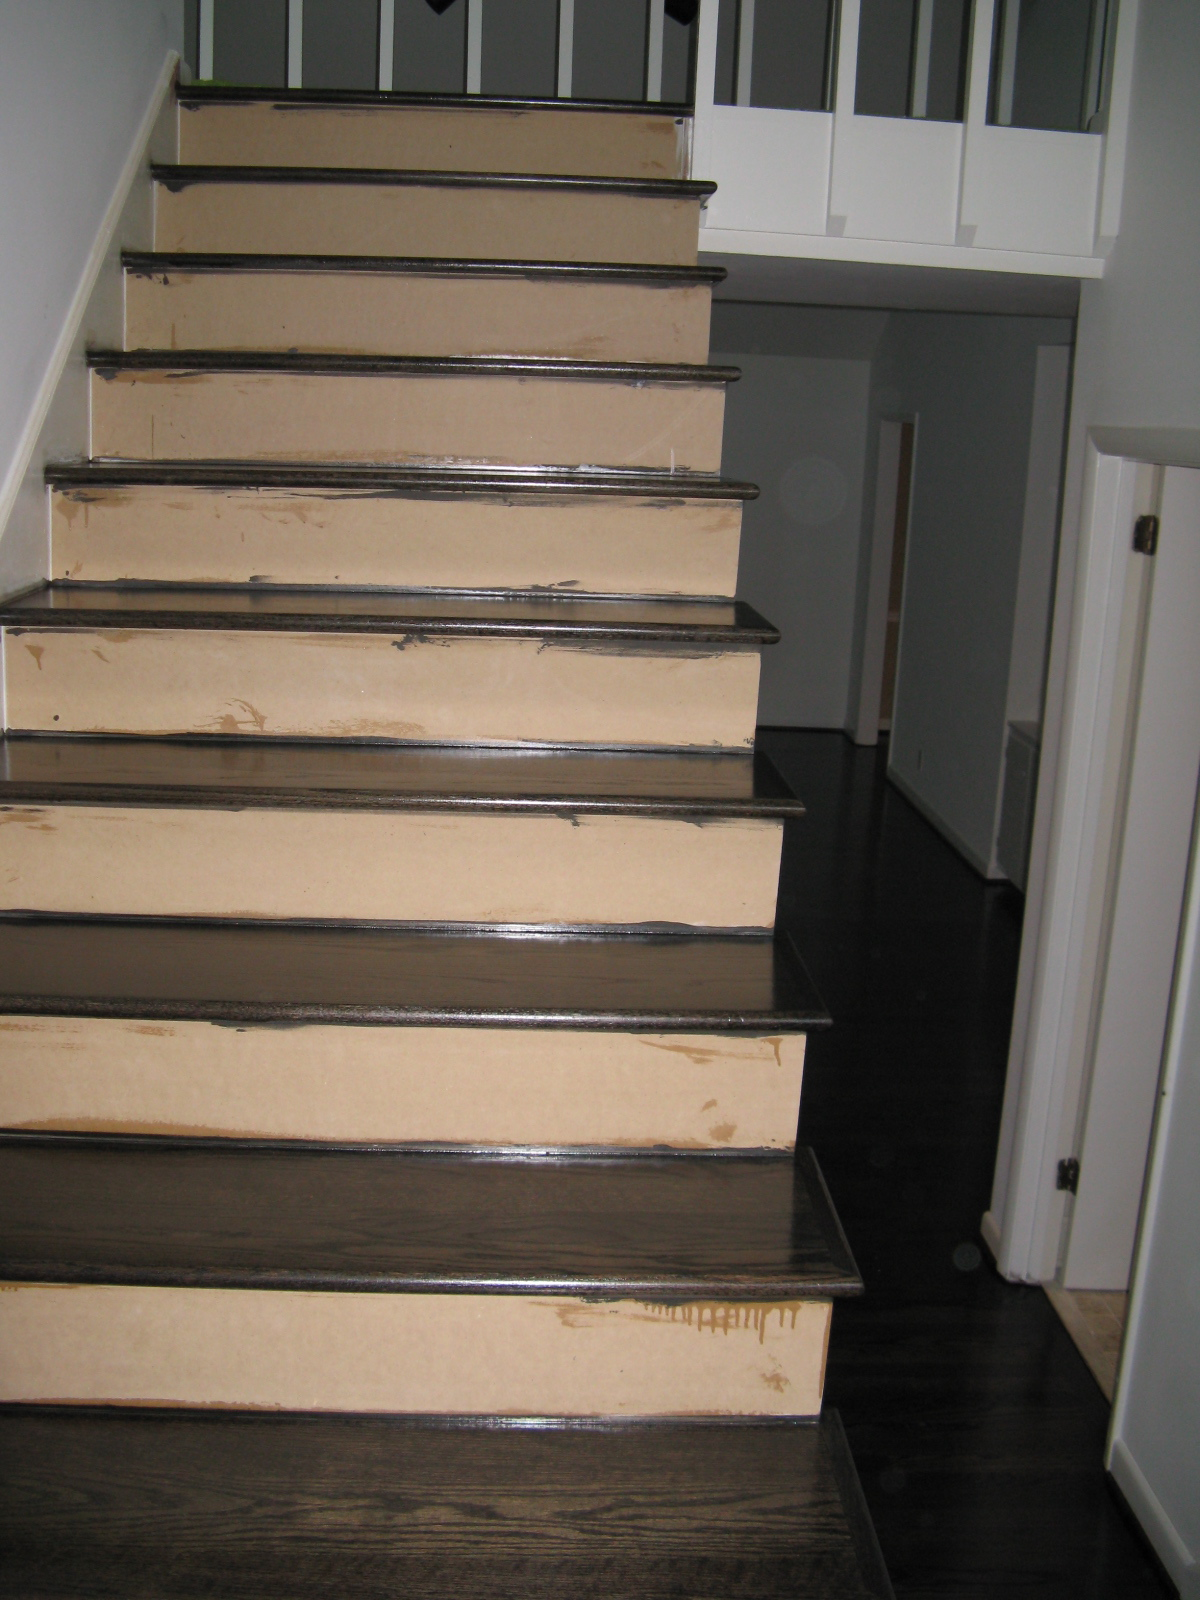 Ebony Stained Hardwood Floors M O D F R U G A L